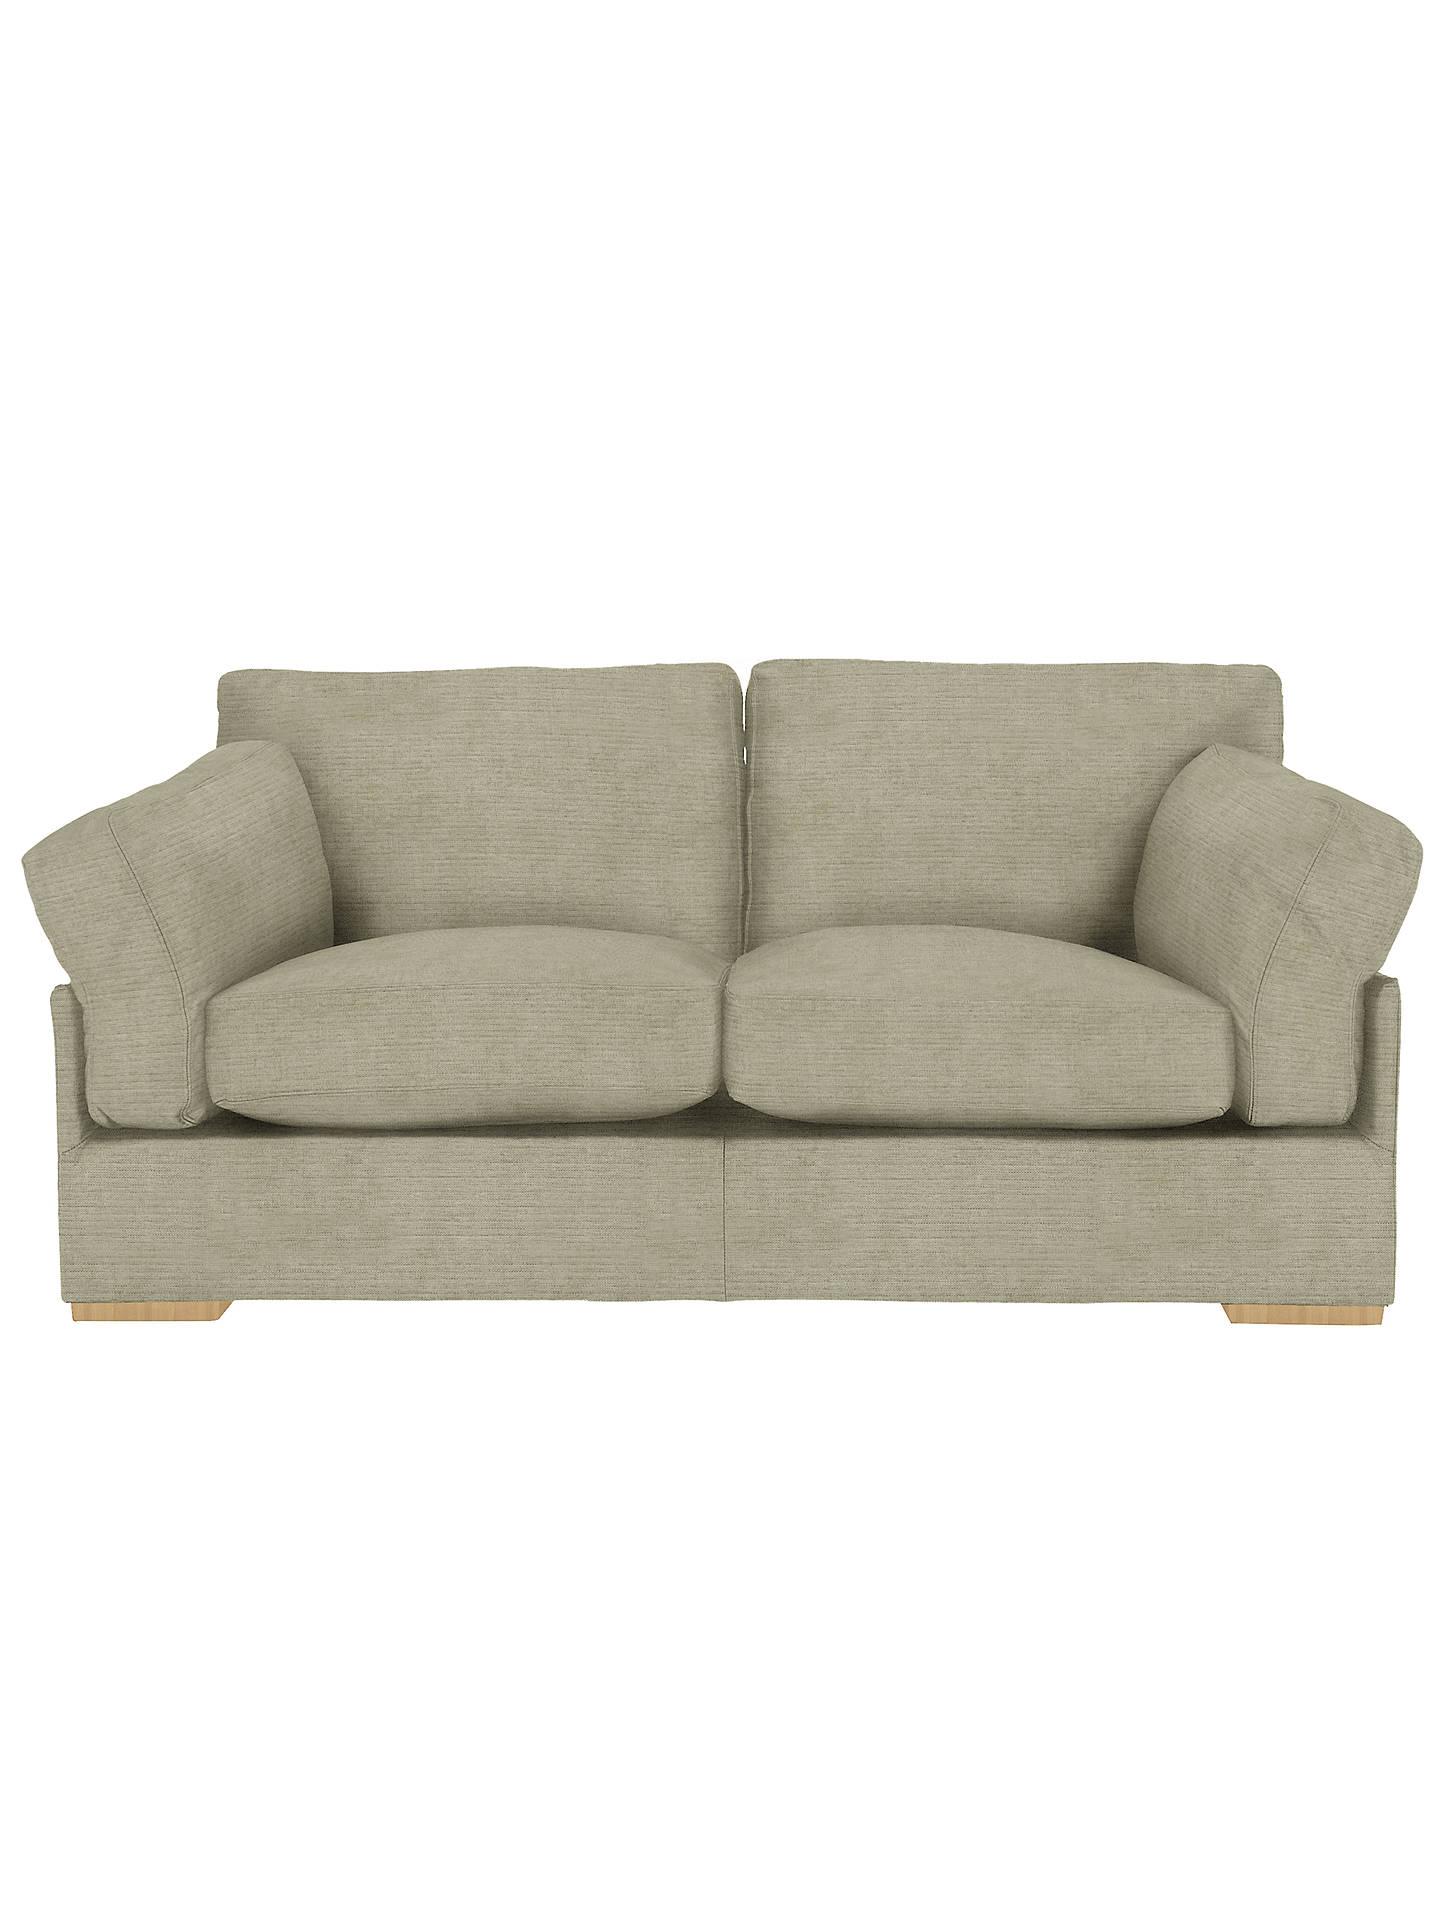 Cool John Lewis Java Medium Sofa Elena Mocha At John Lewis Cjindustries Chair Design For Home Cjindustriesco